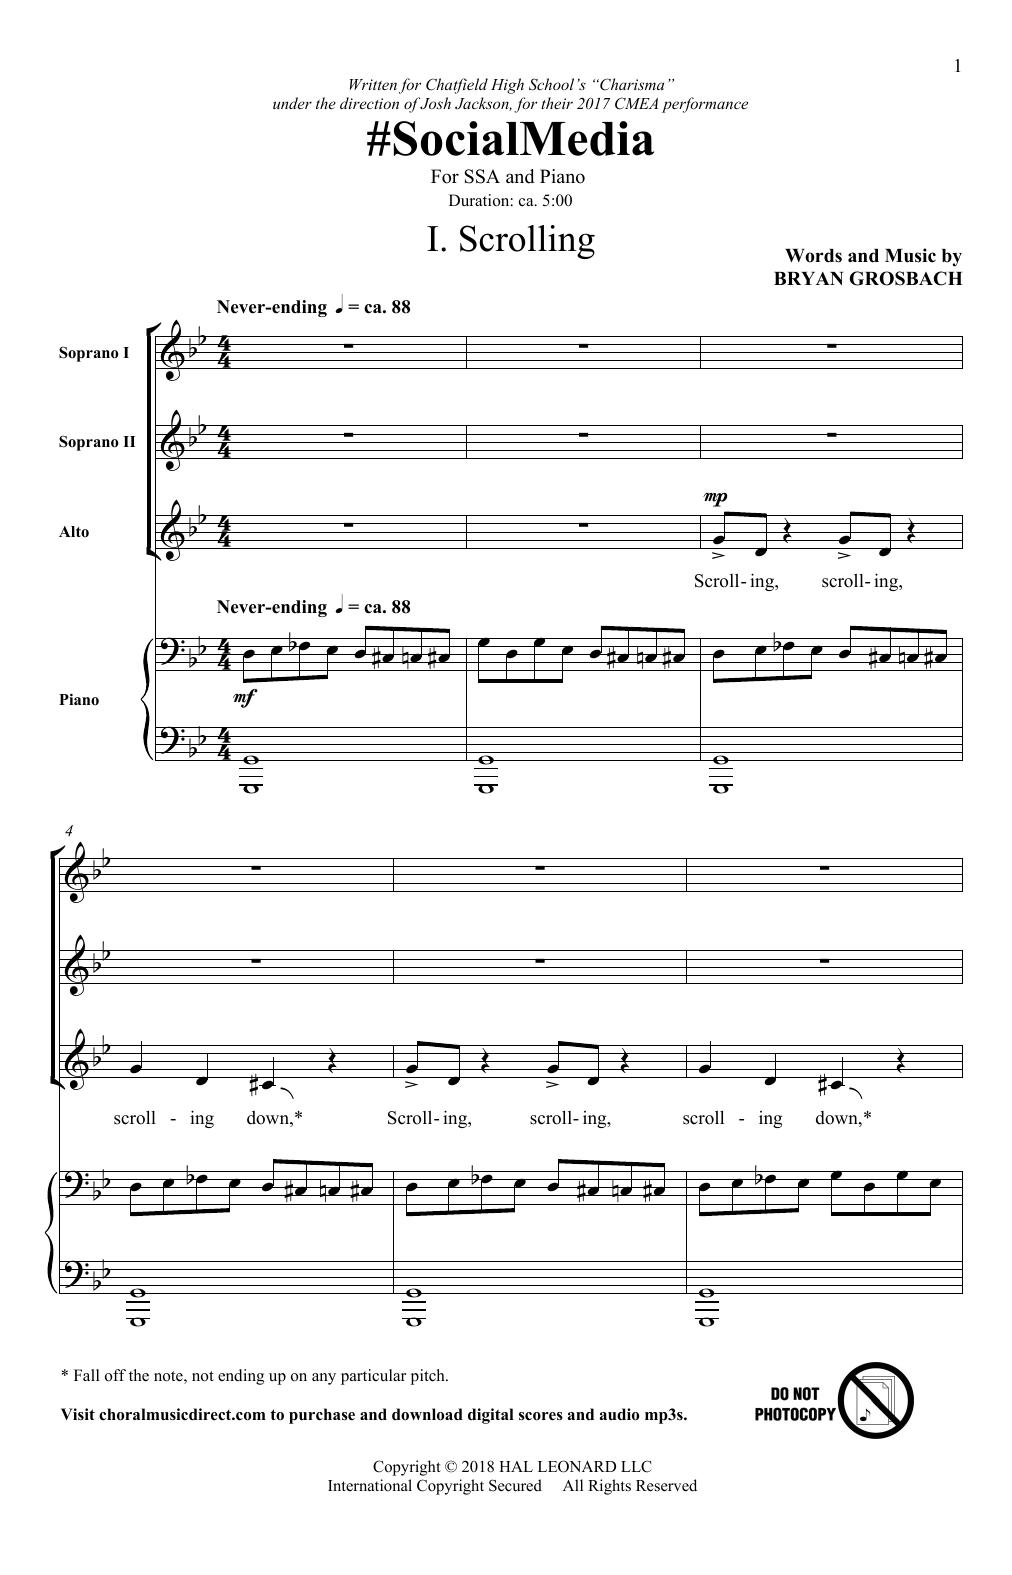 #SocialMedia (SSA Choir)